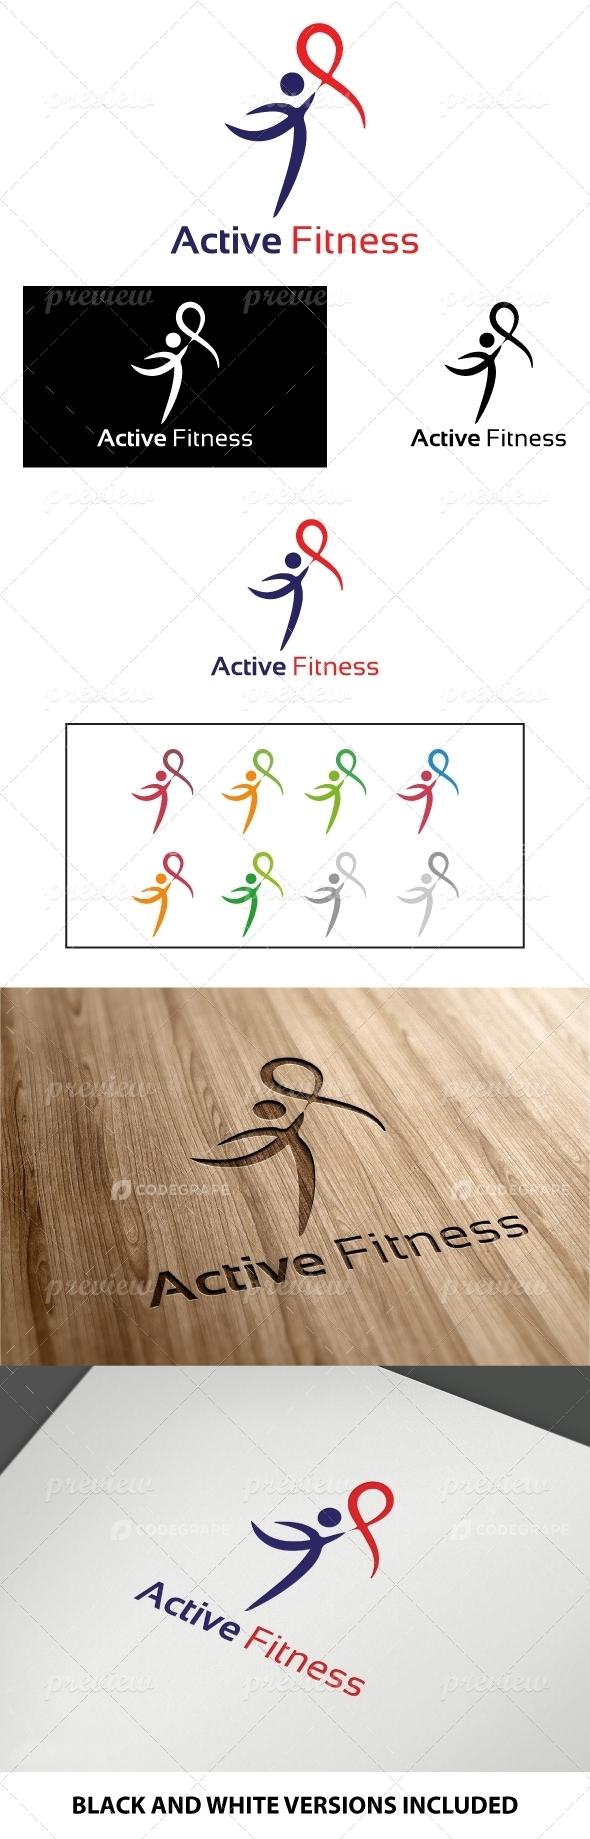 Active Fitness Logo